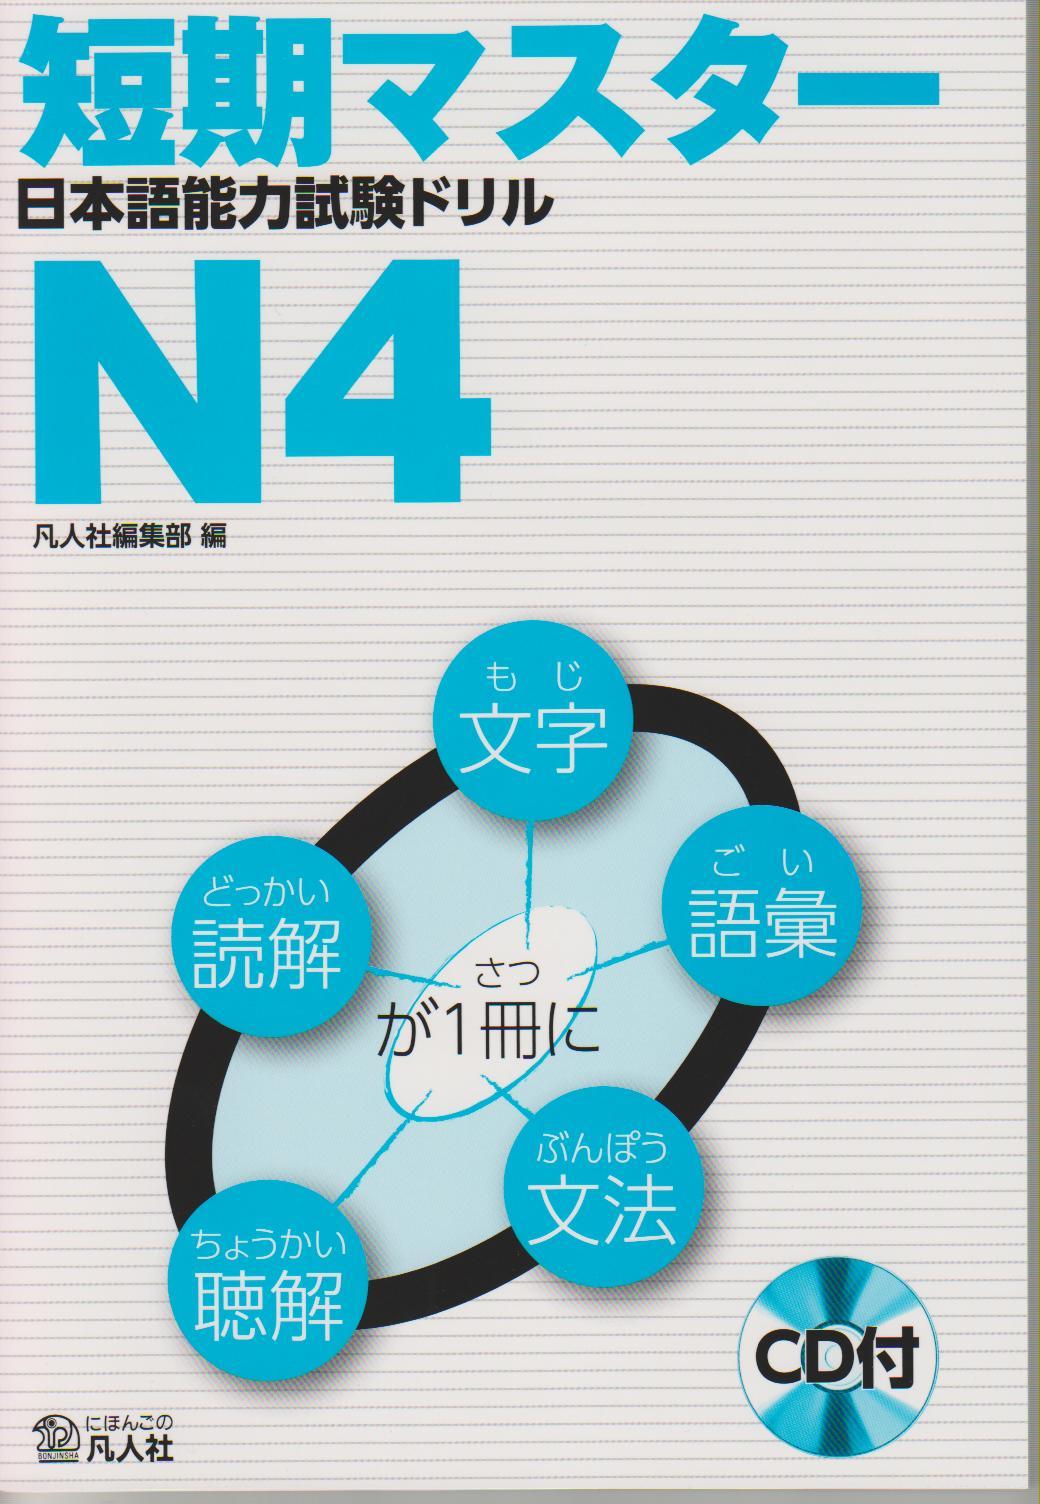 Tanki Master Japanese Language Proficiency Test N4 Workbook, 260 g